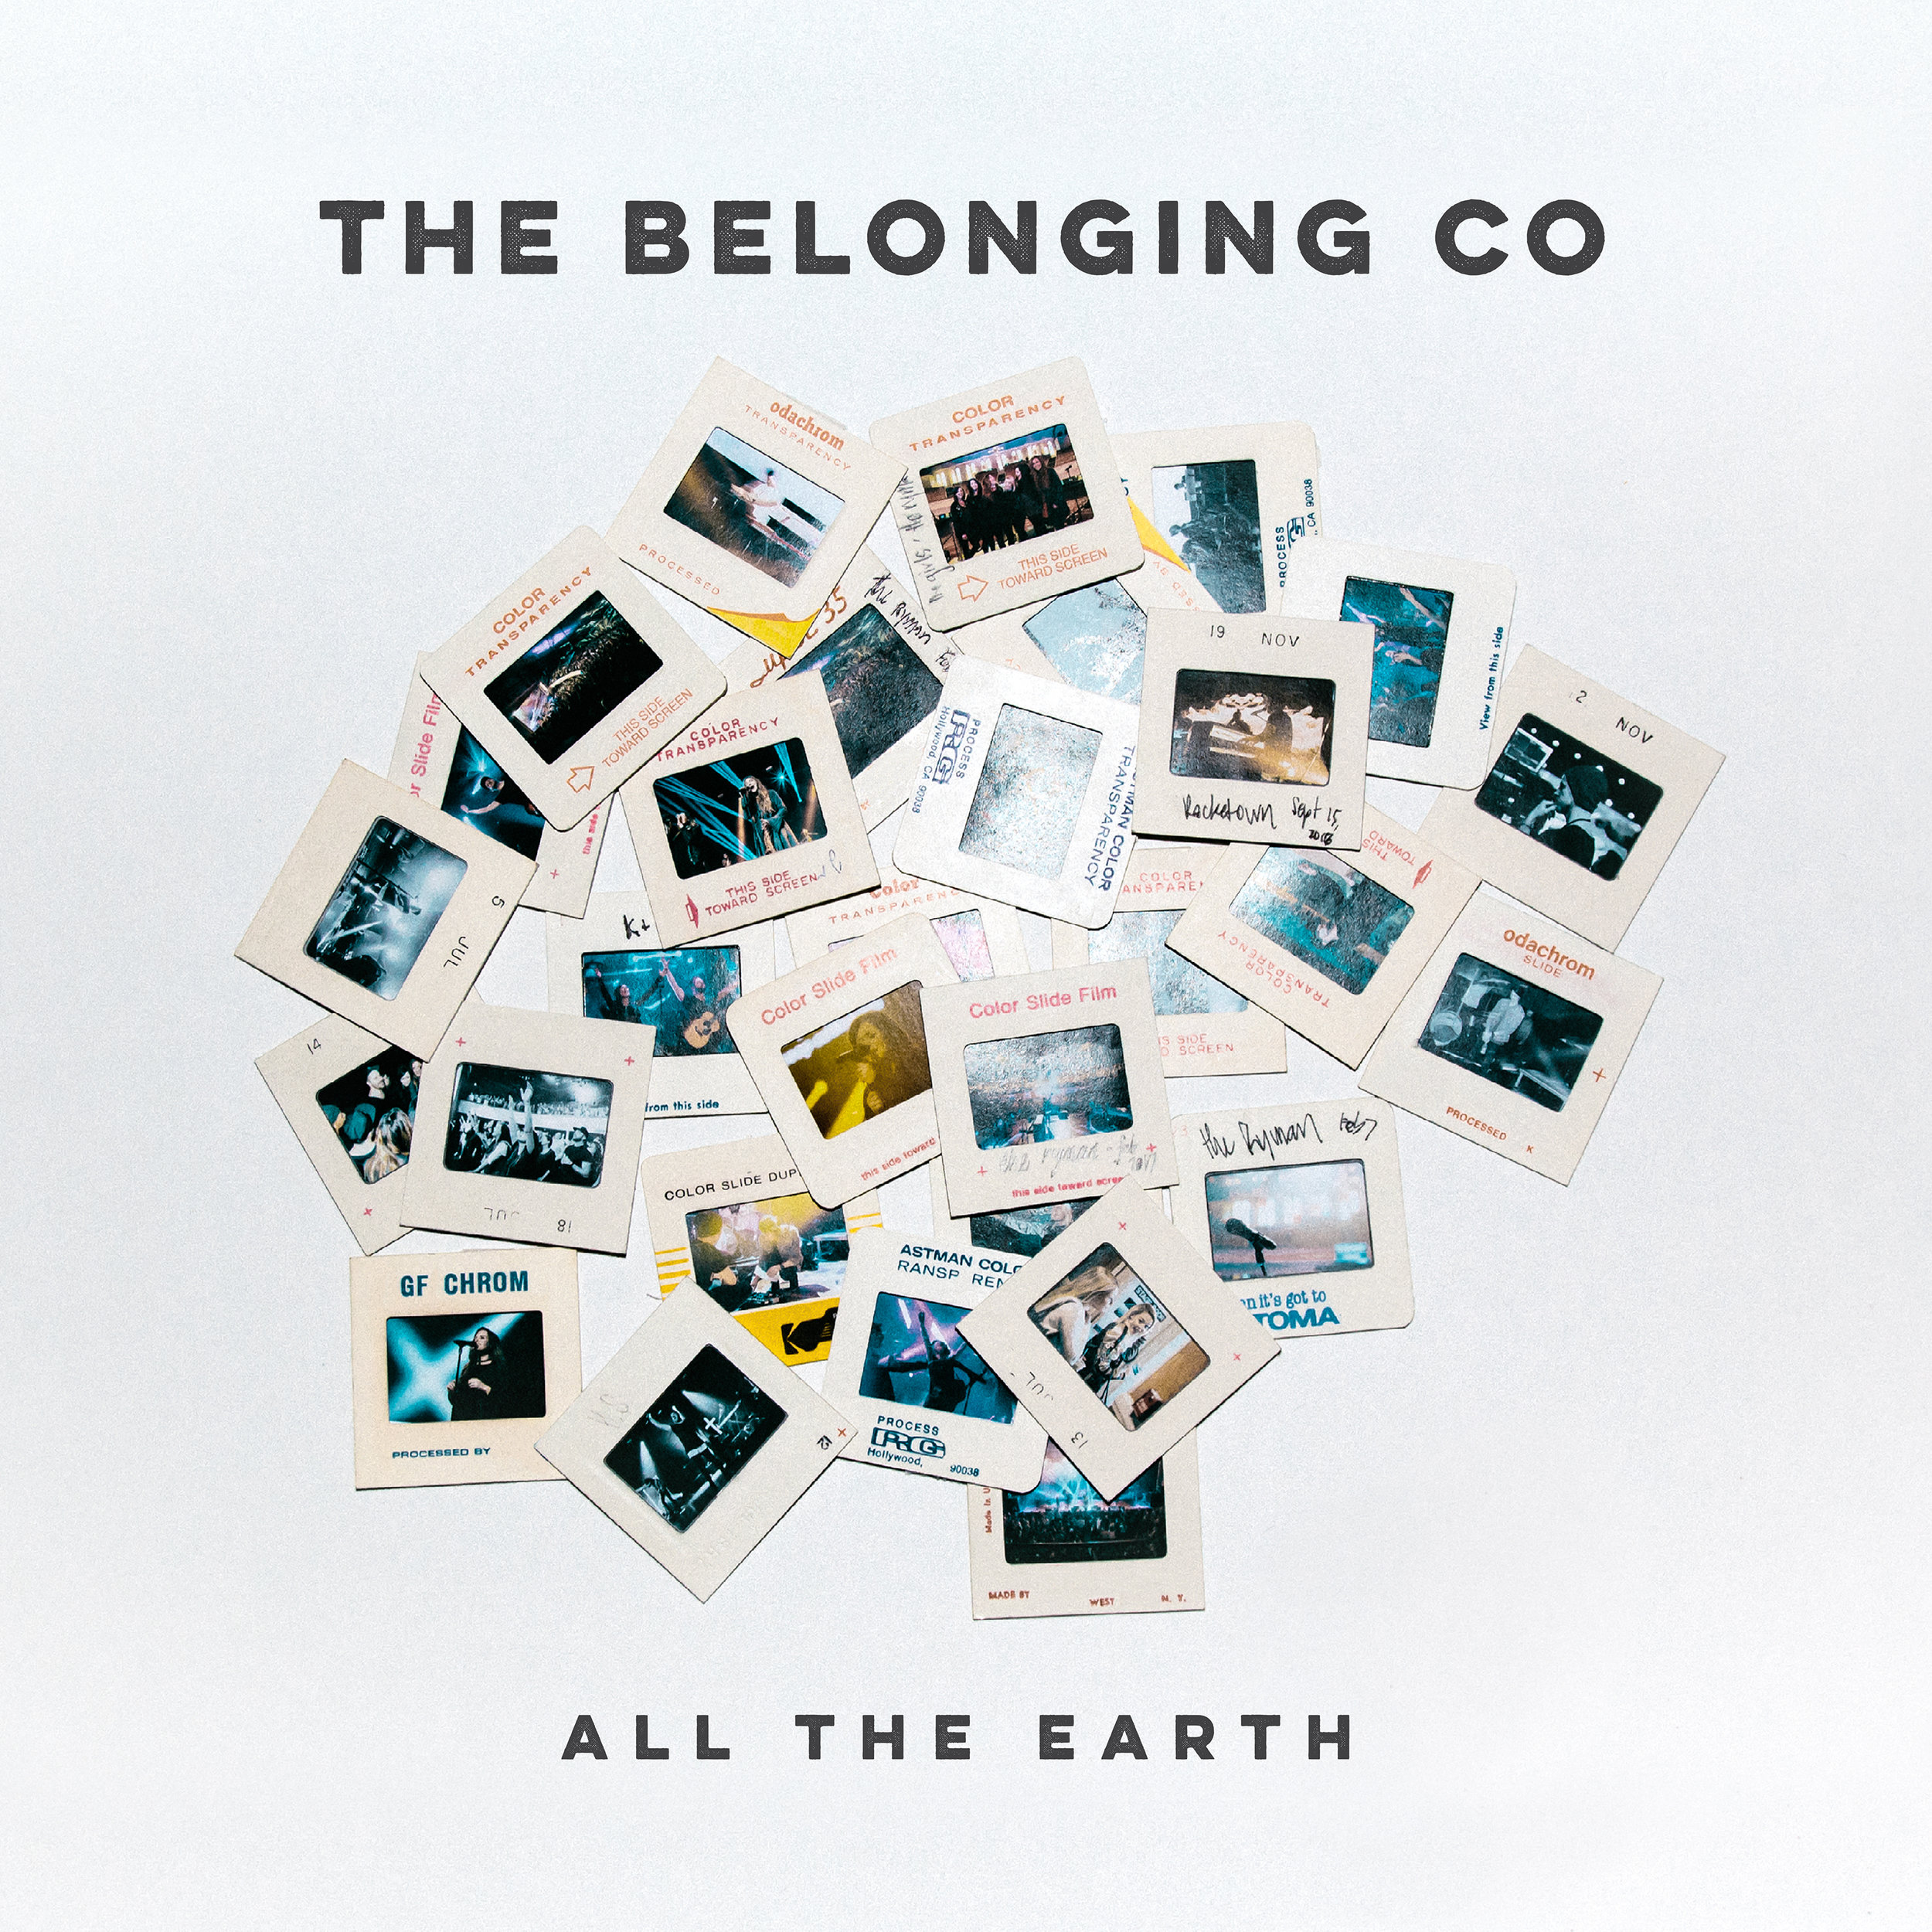 TBCO_All_The_Earth_Cover_3000.jpg